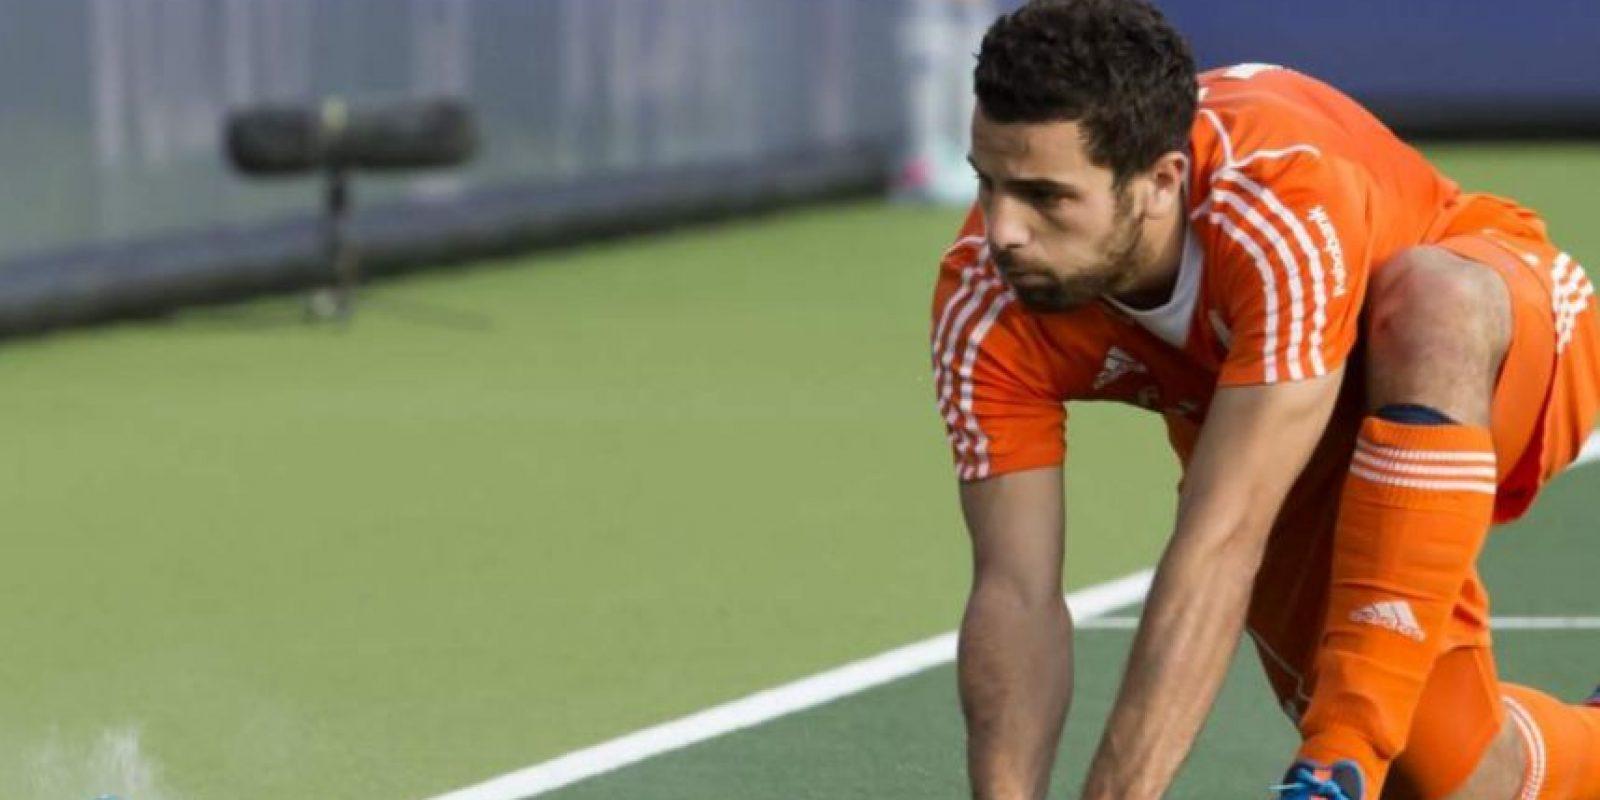 Valentín Verga – Jugador de jockey sobre césped argentino que se nacionalizó holandés. Foto:Getty Images